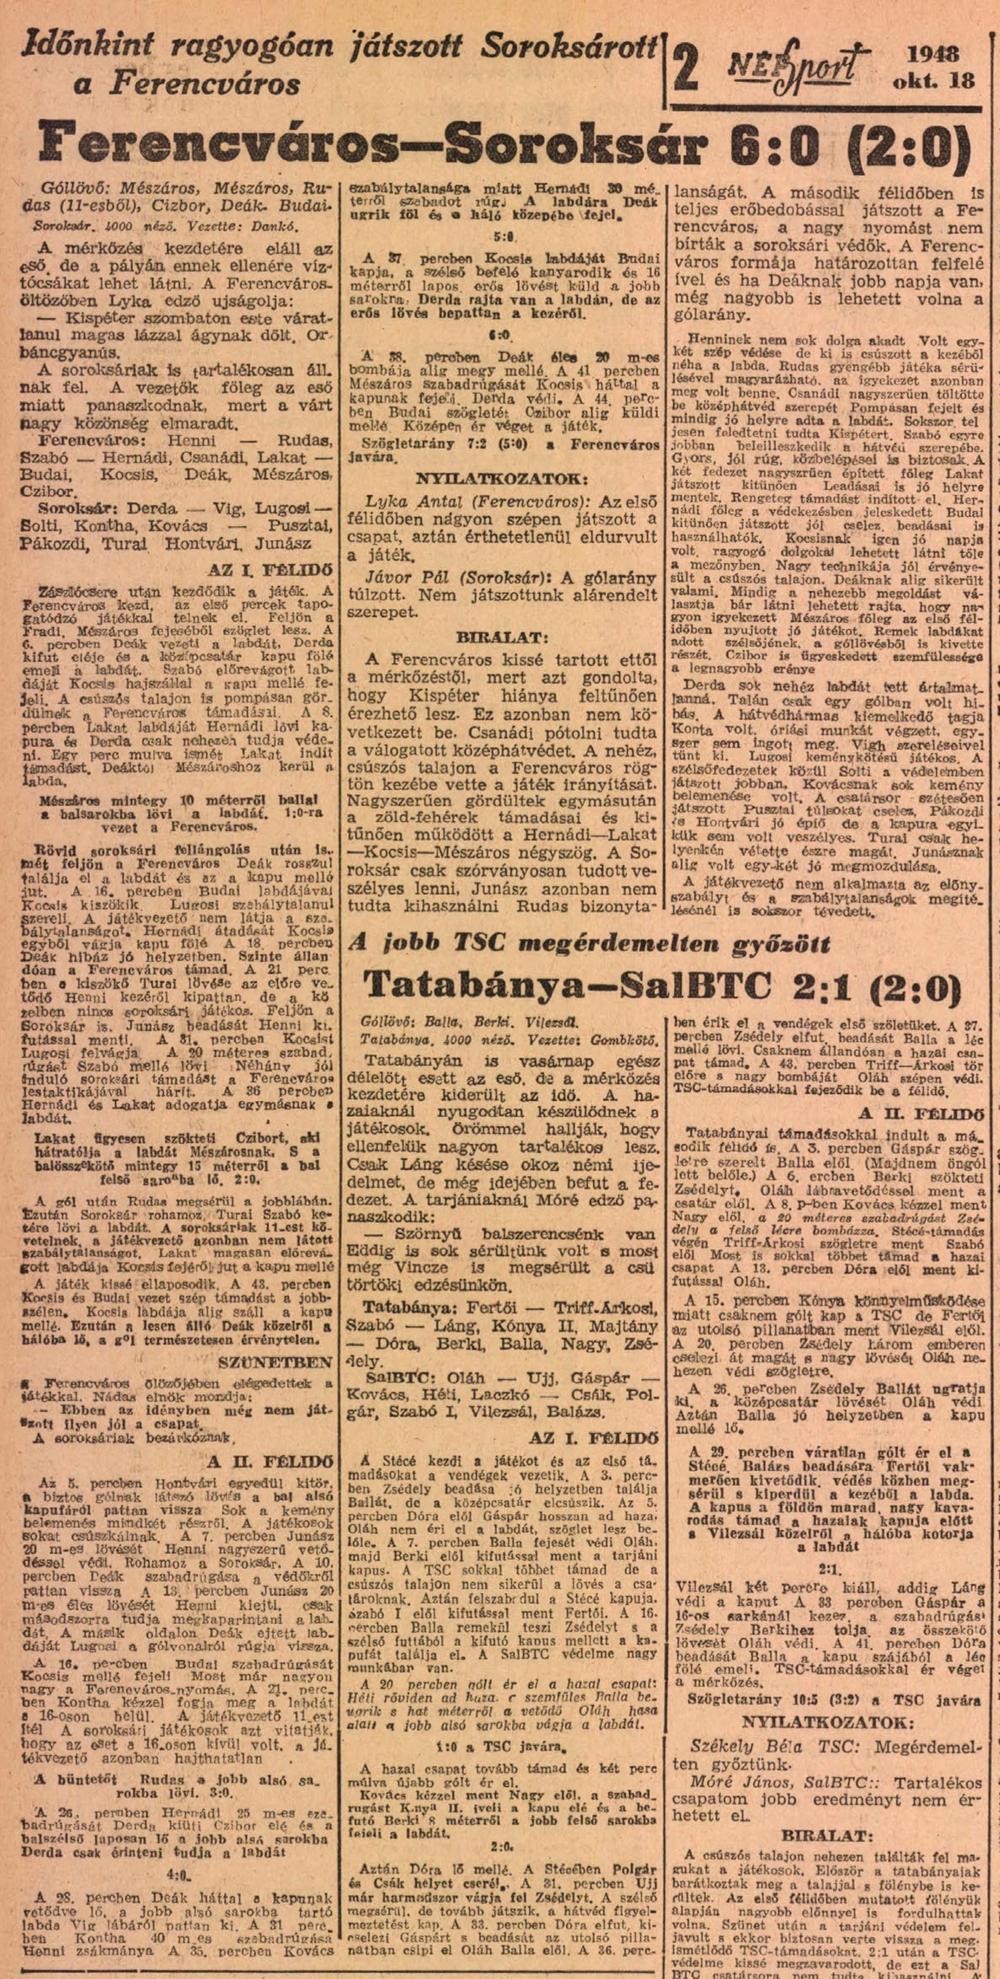 NS-19481018-02-19481017